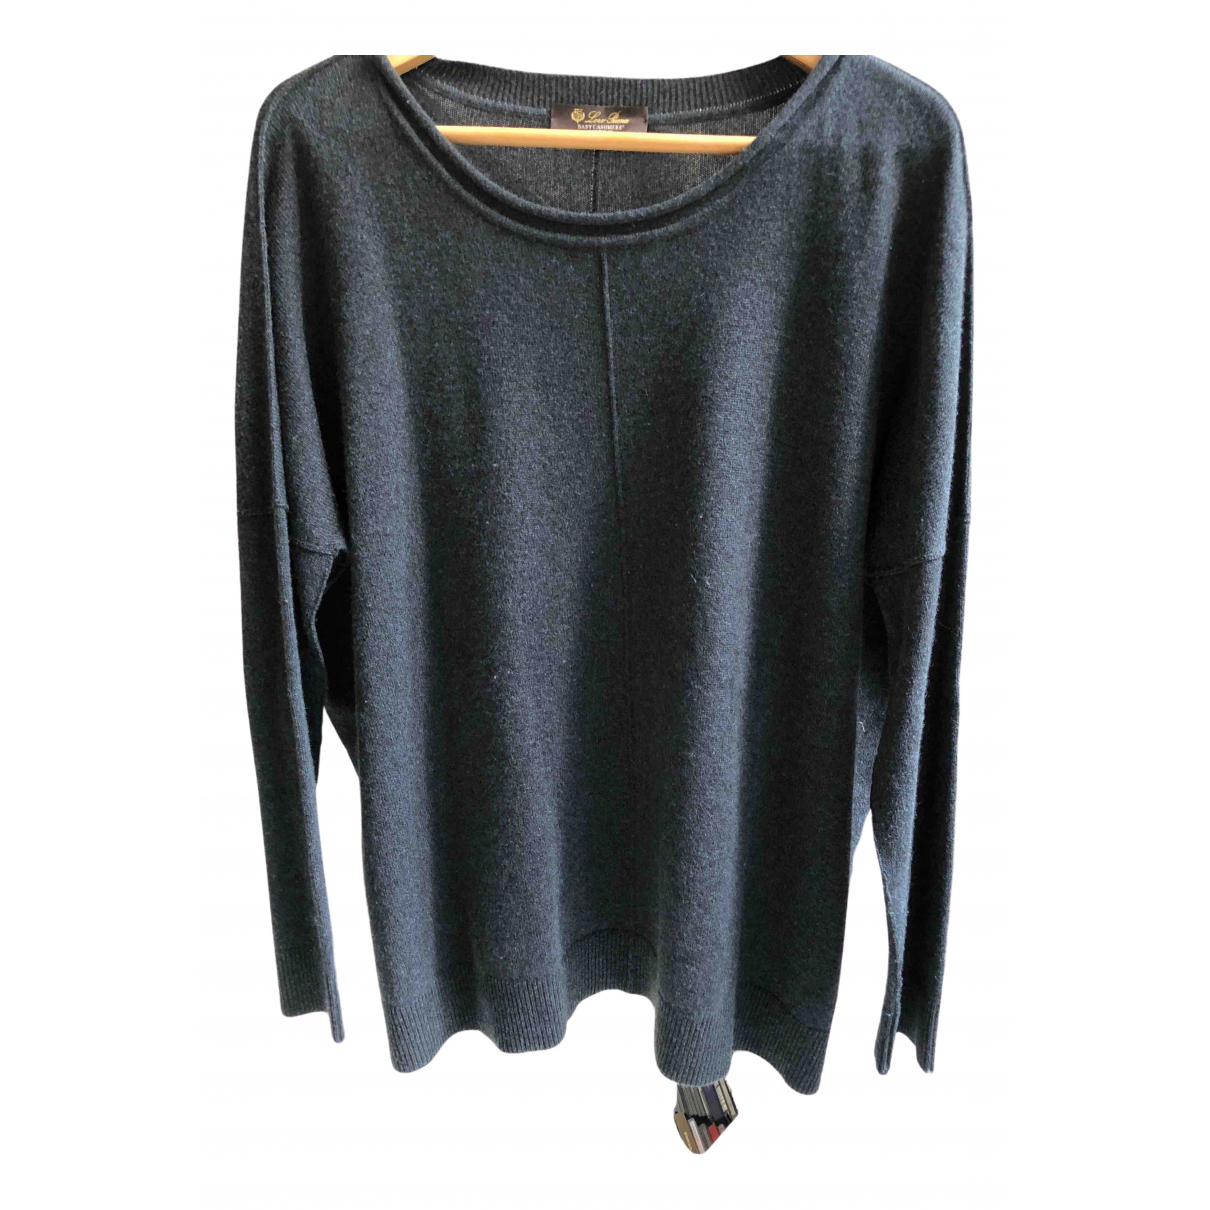 Loro Piana \N Anthracite Cashmere Knitwear for Women M International